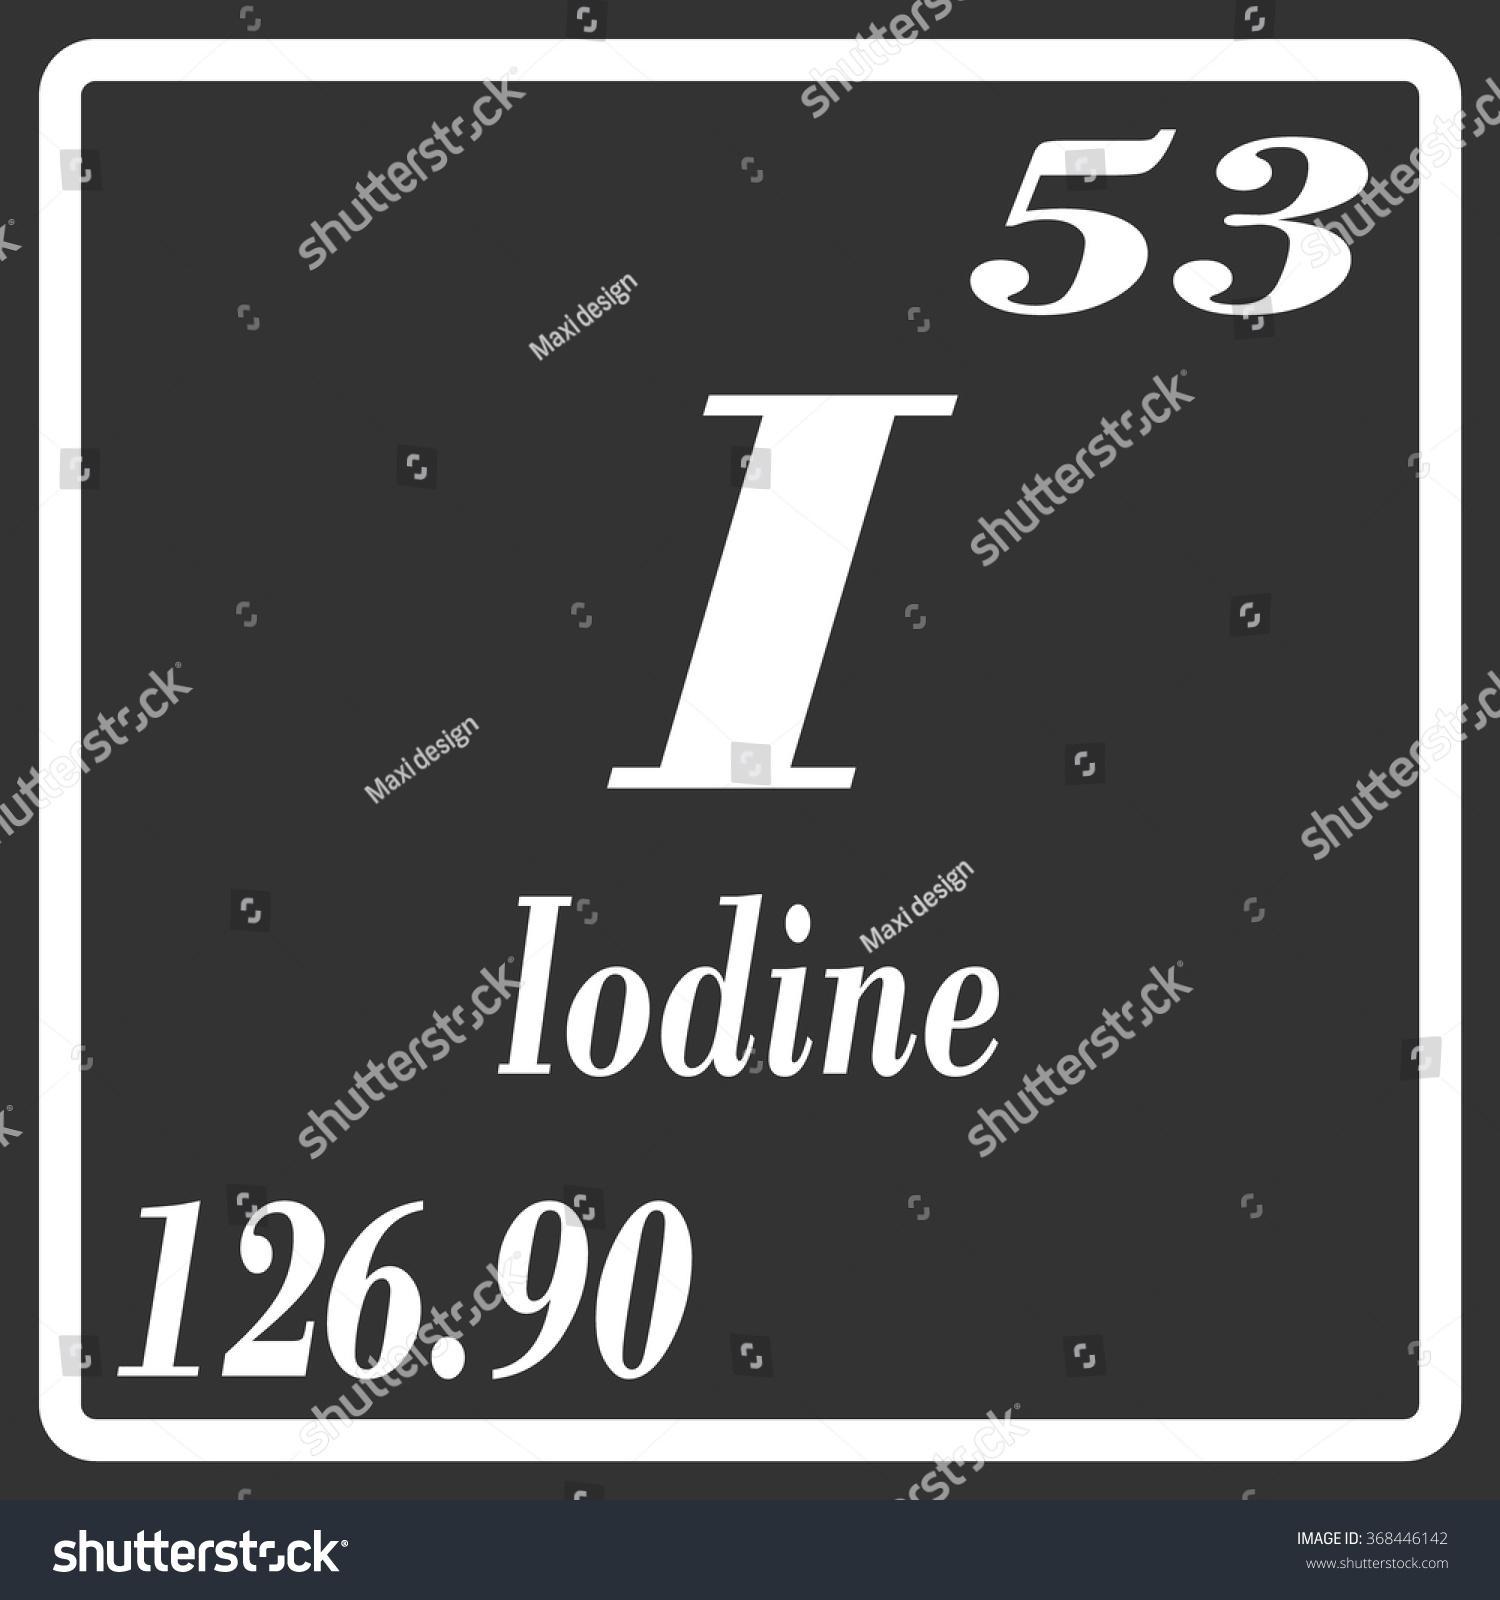 Periodic table elements iodine stock vector 368446142 shutterstock periodic table of elements iodine gamestrikefo Choice Image